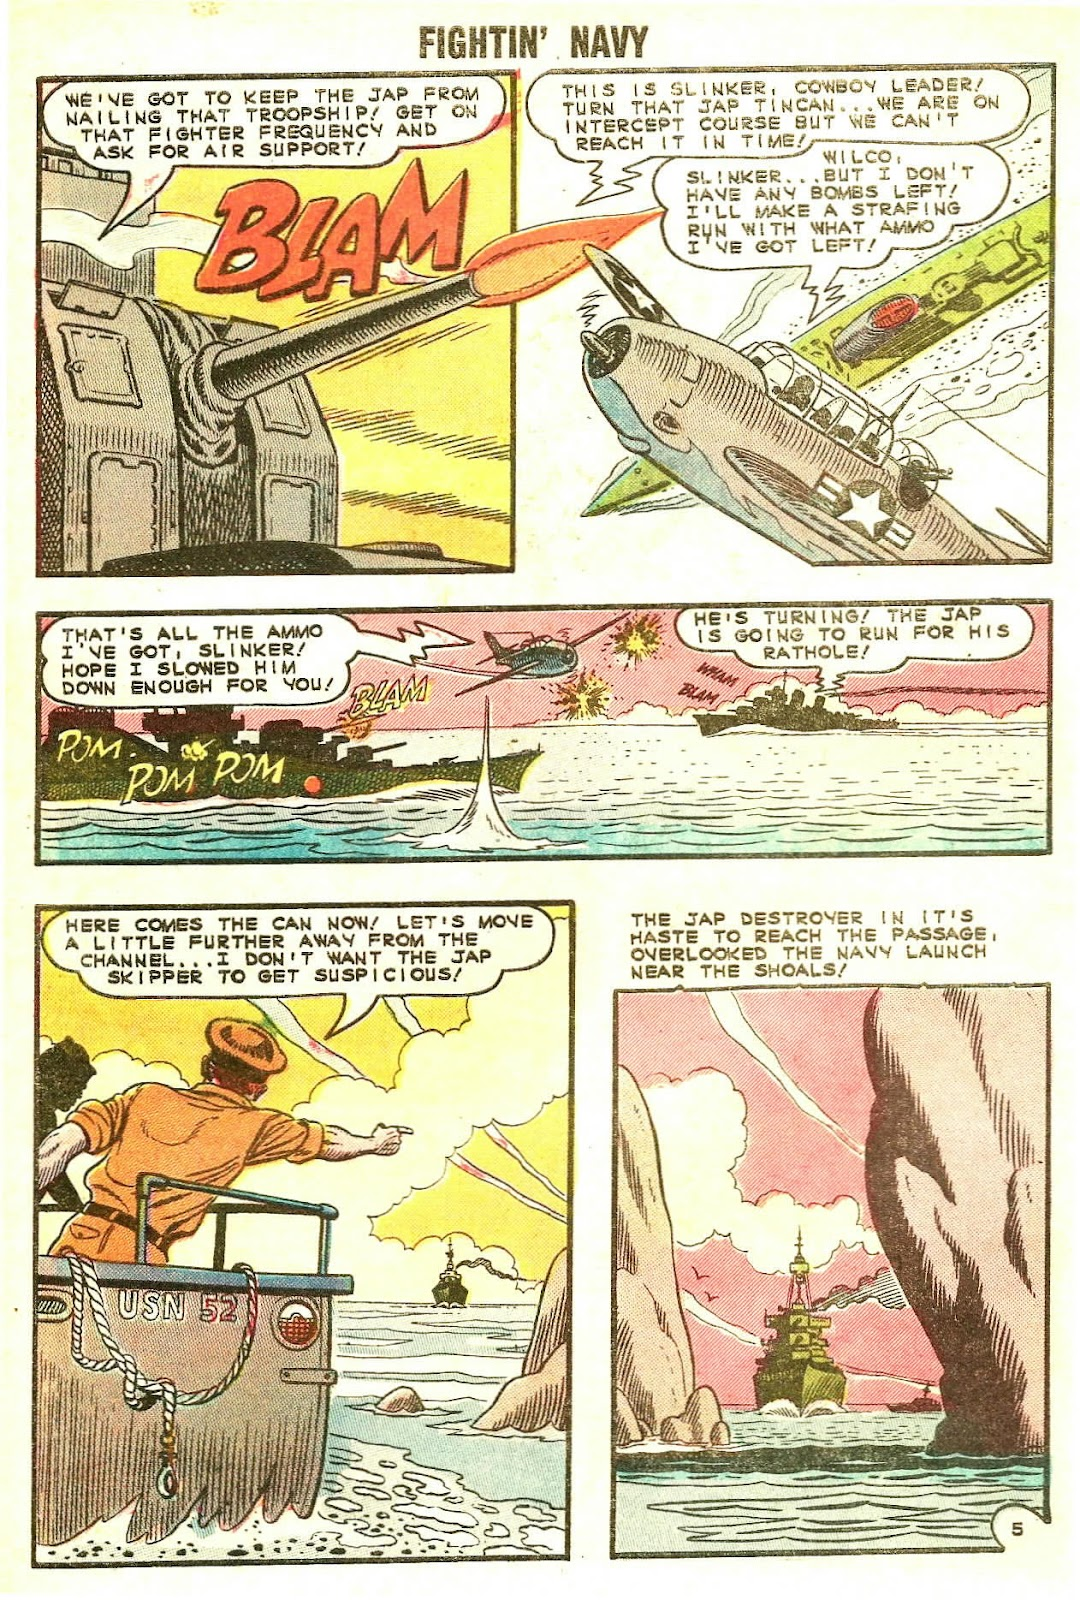 Read online Fightin' Navy comic -  Issue #120 - 8